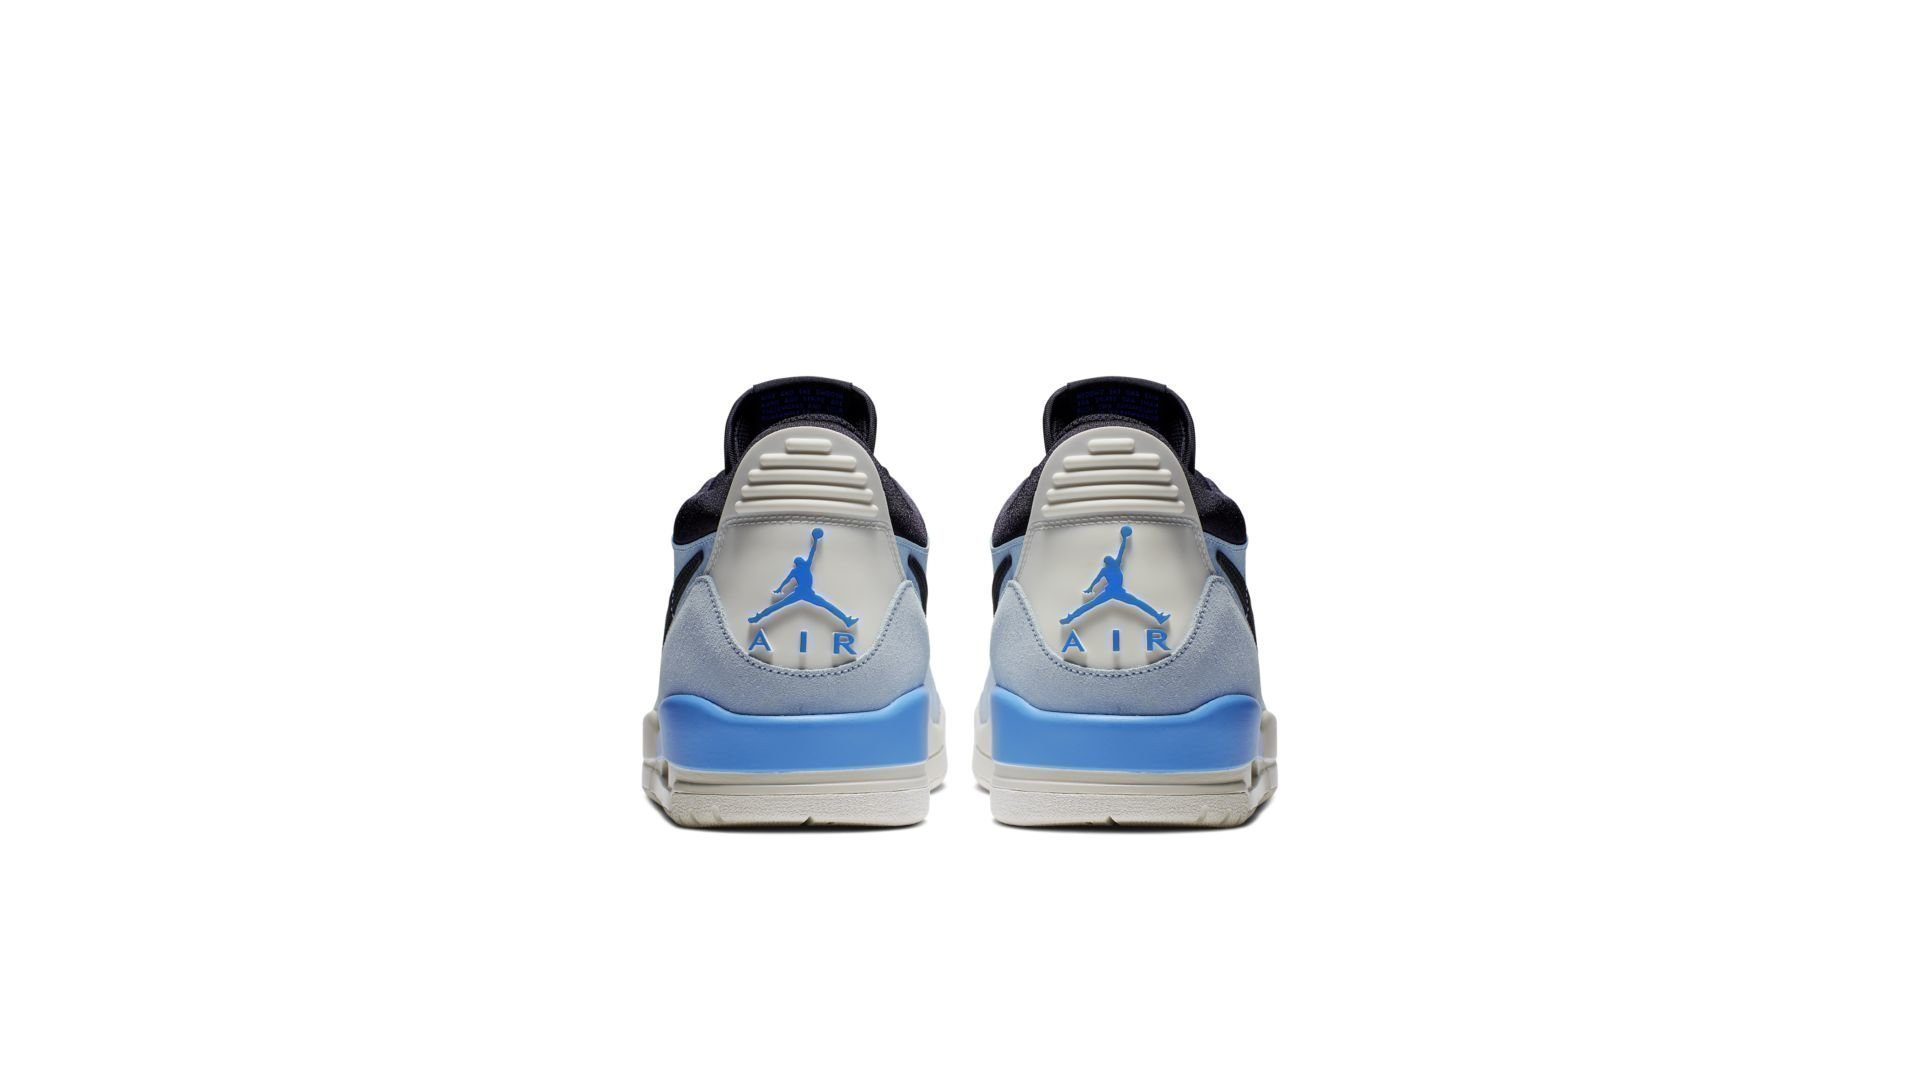 Jordan Legacy 312 Low Psychic Blue (CD7069-400)